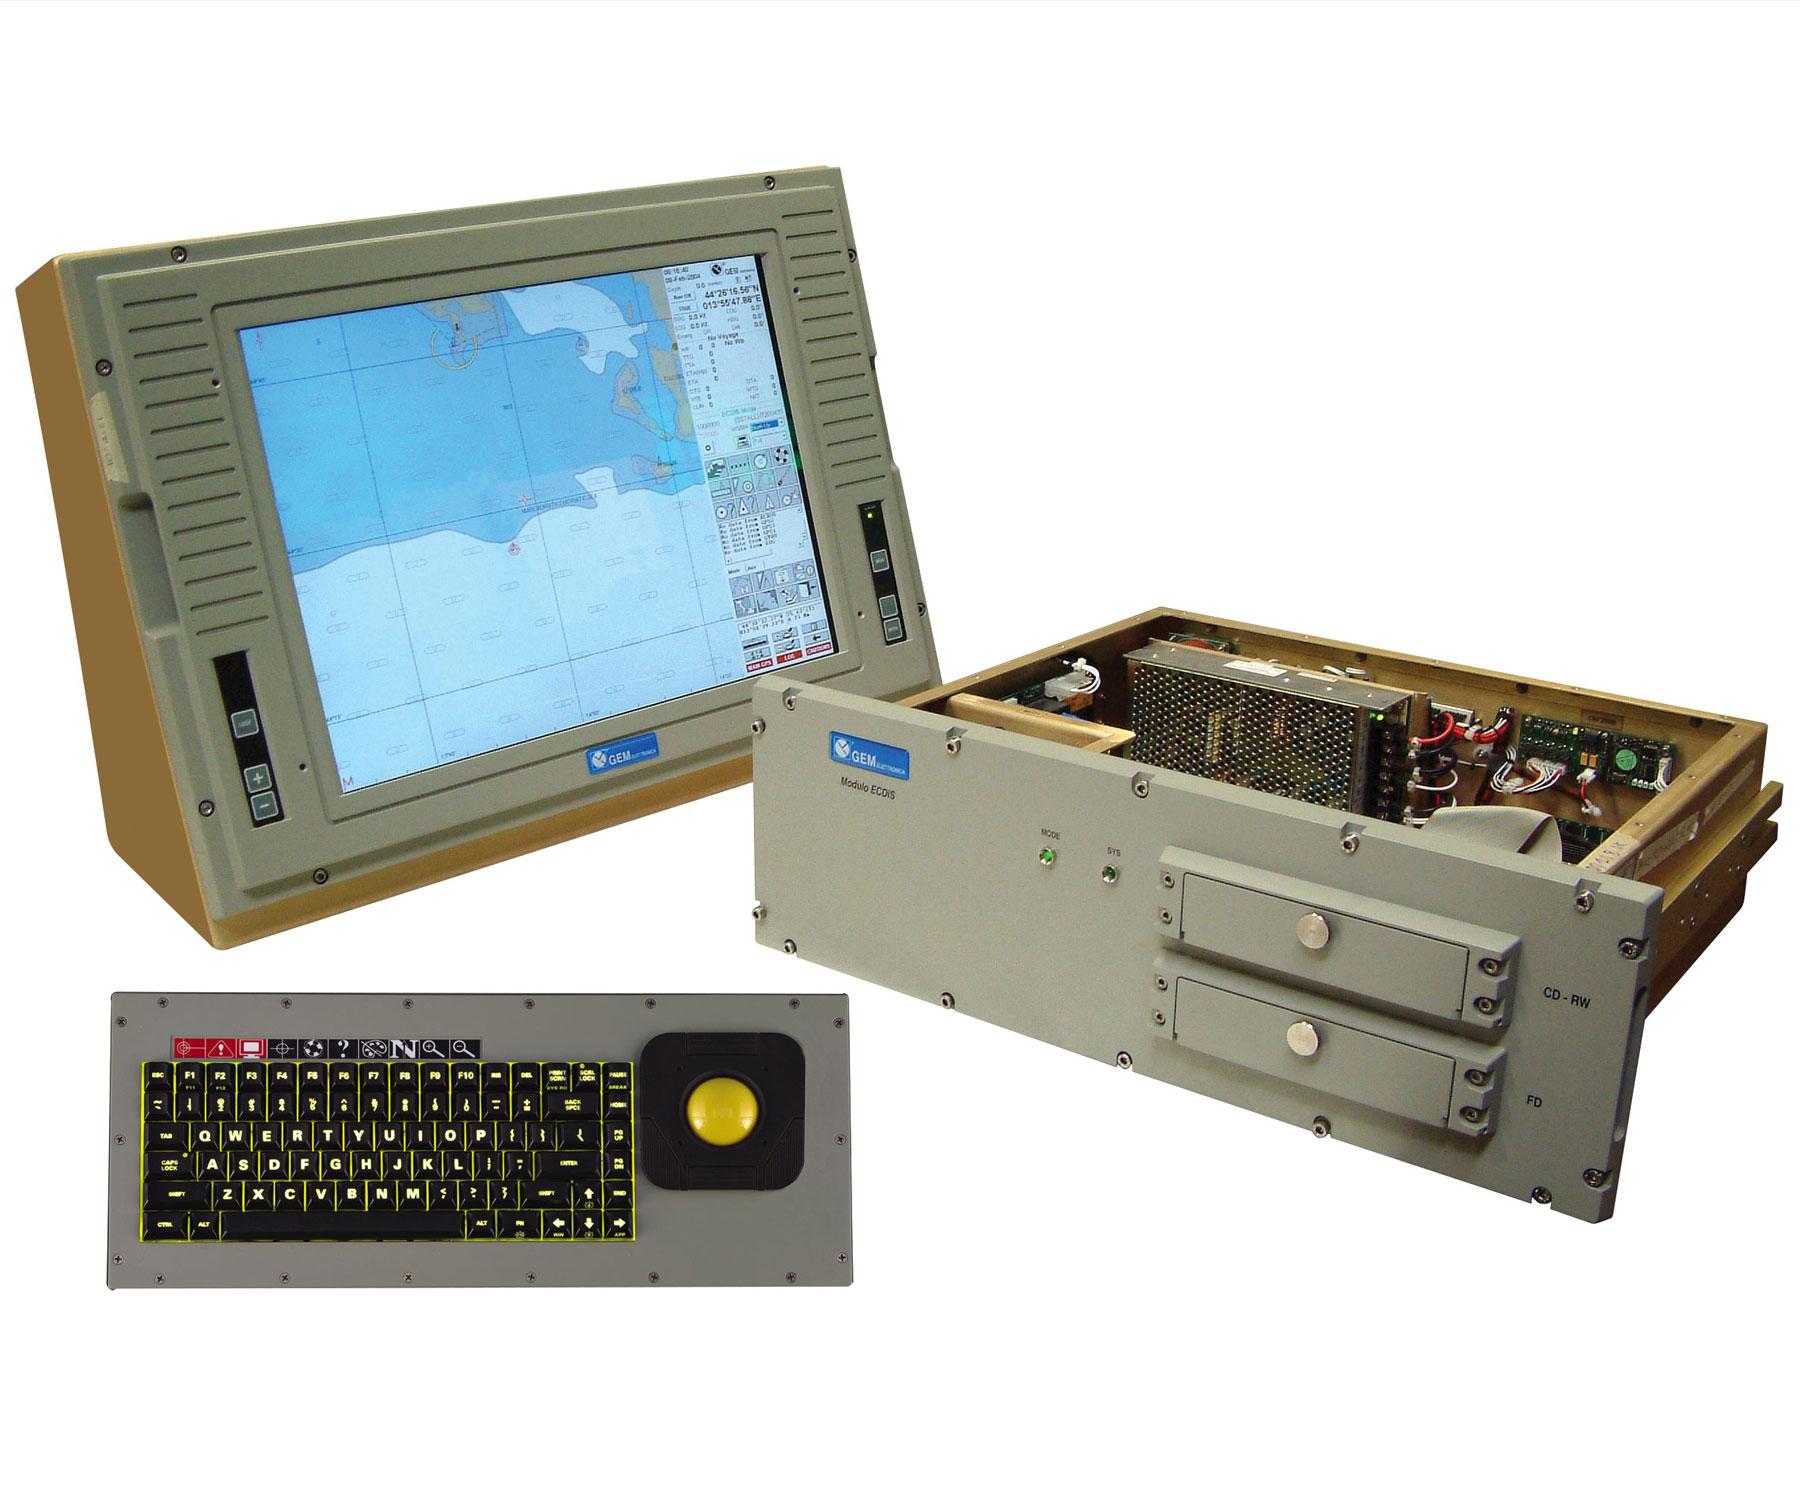 Ecdis600